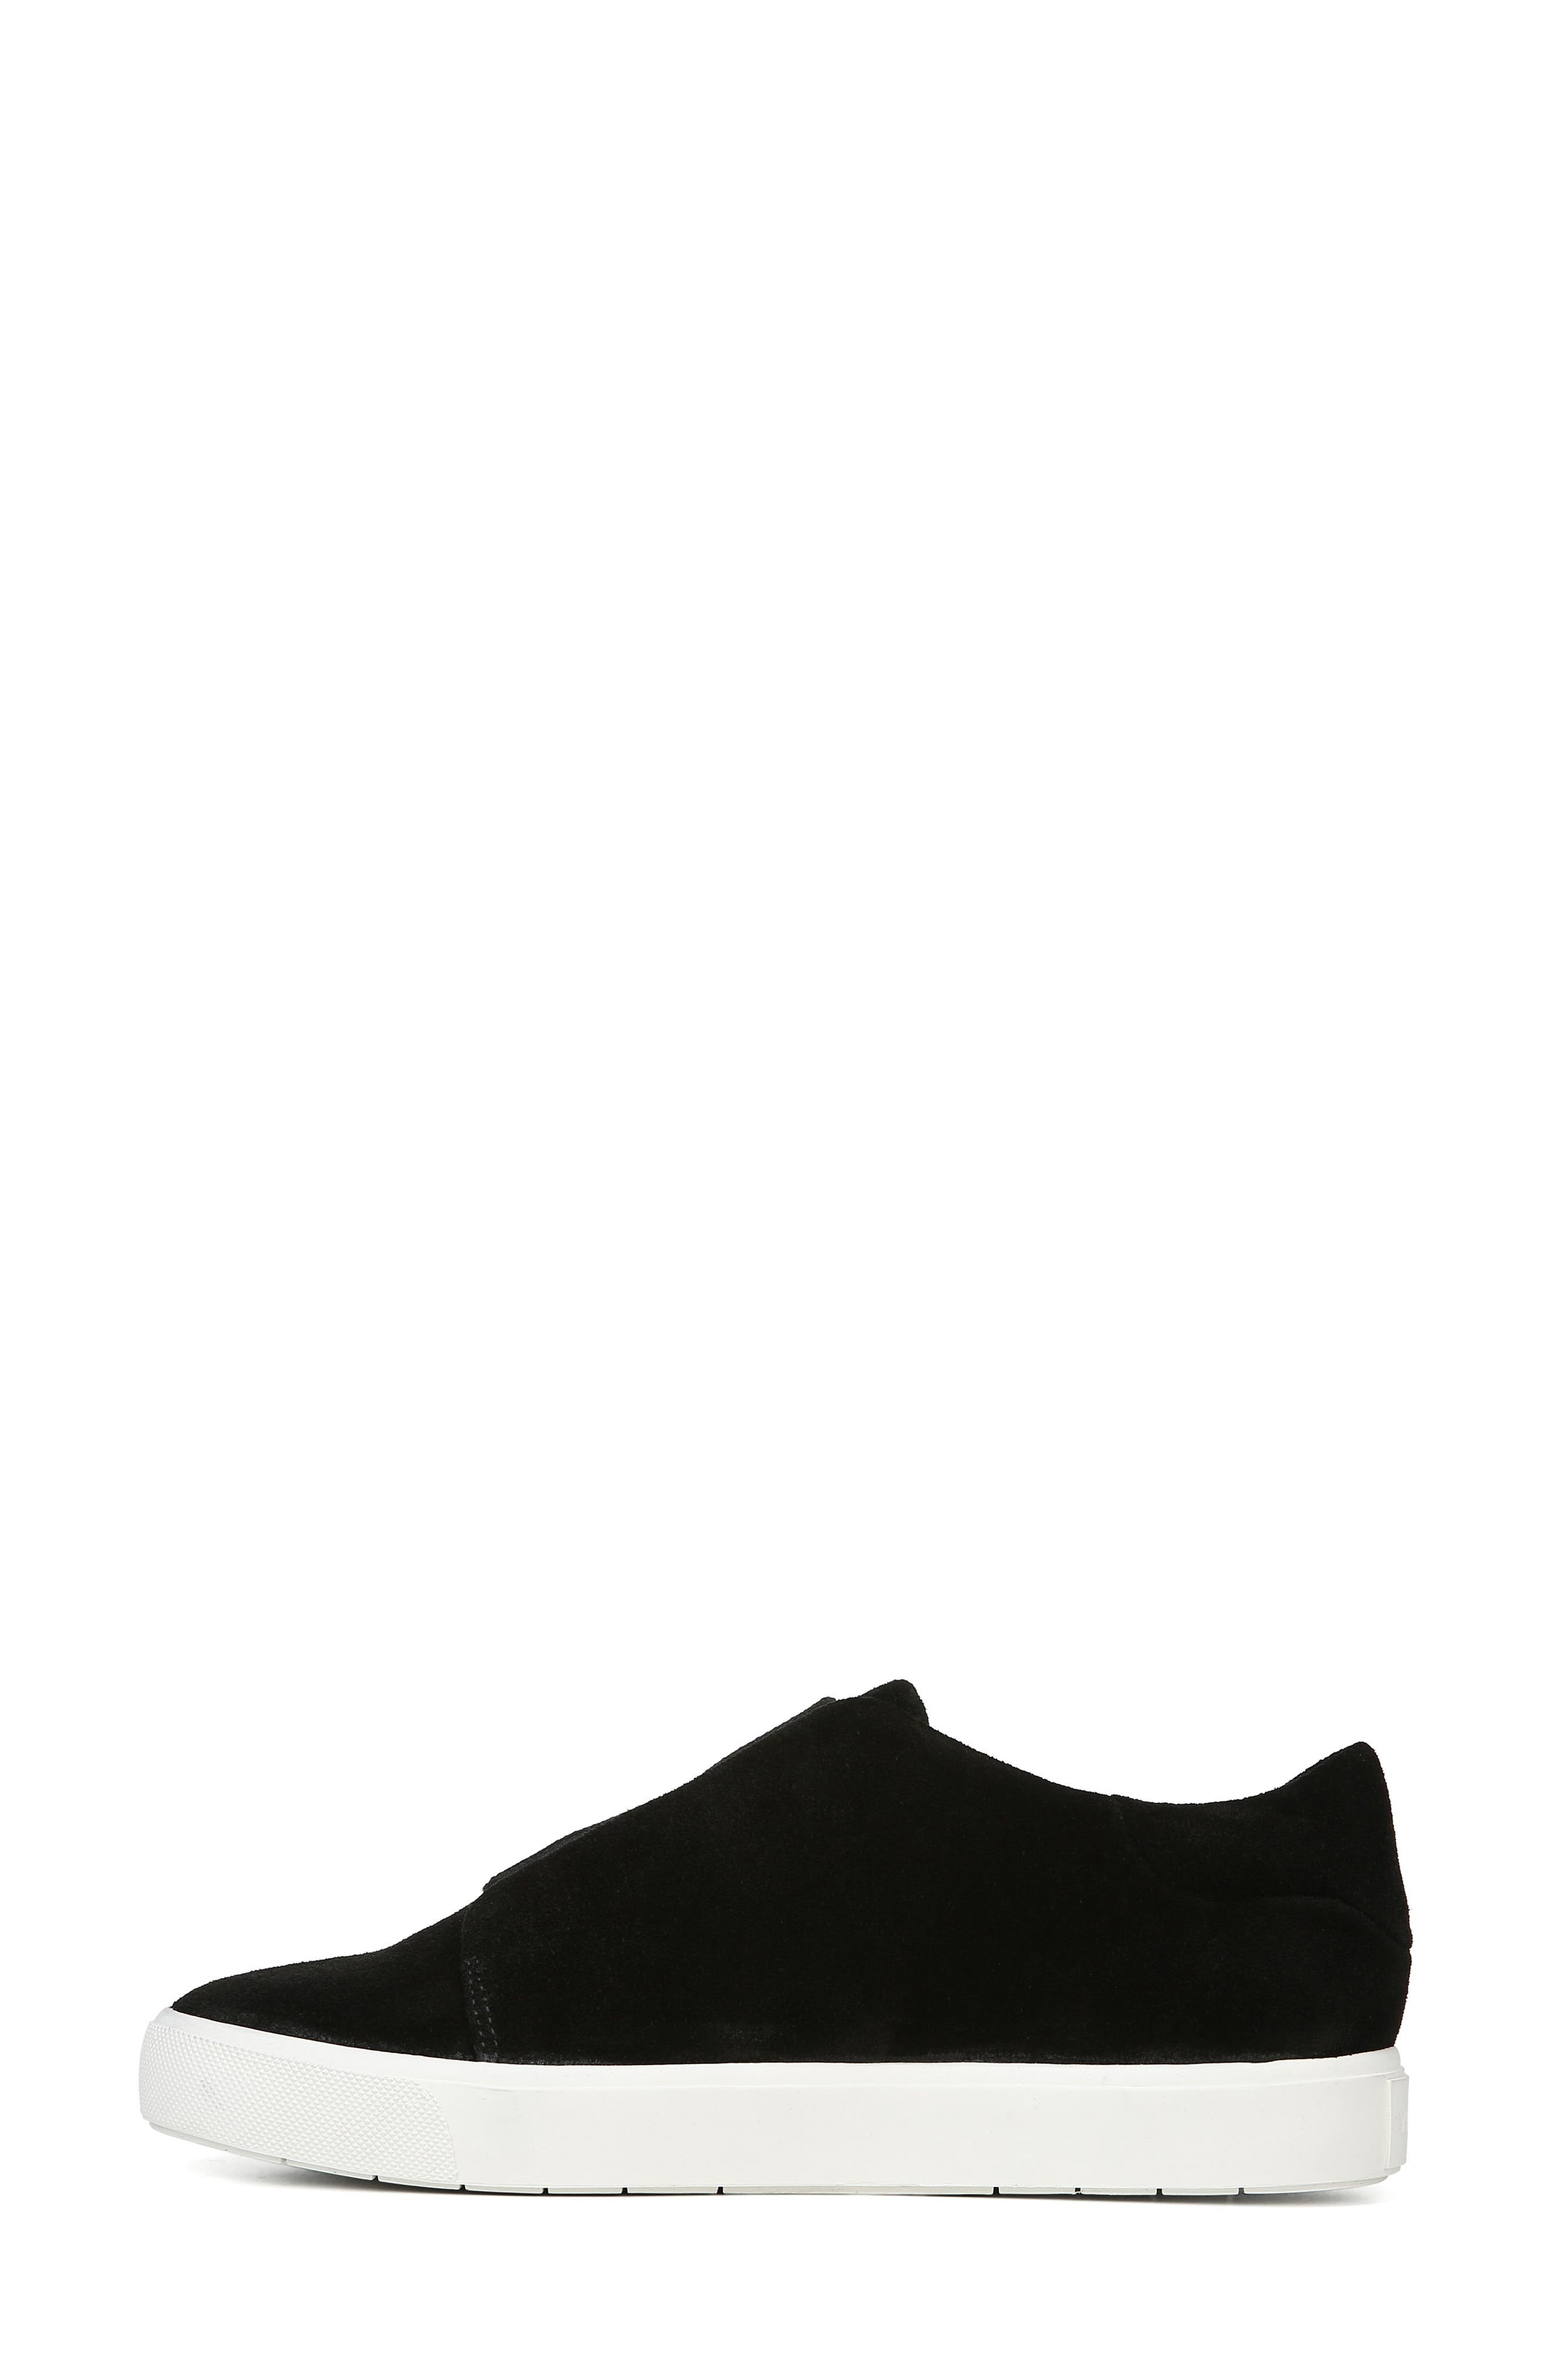 Cantara Slip-On Sneaker,                             Alternate thumbnail 8, color,                             BLACK SUEDE